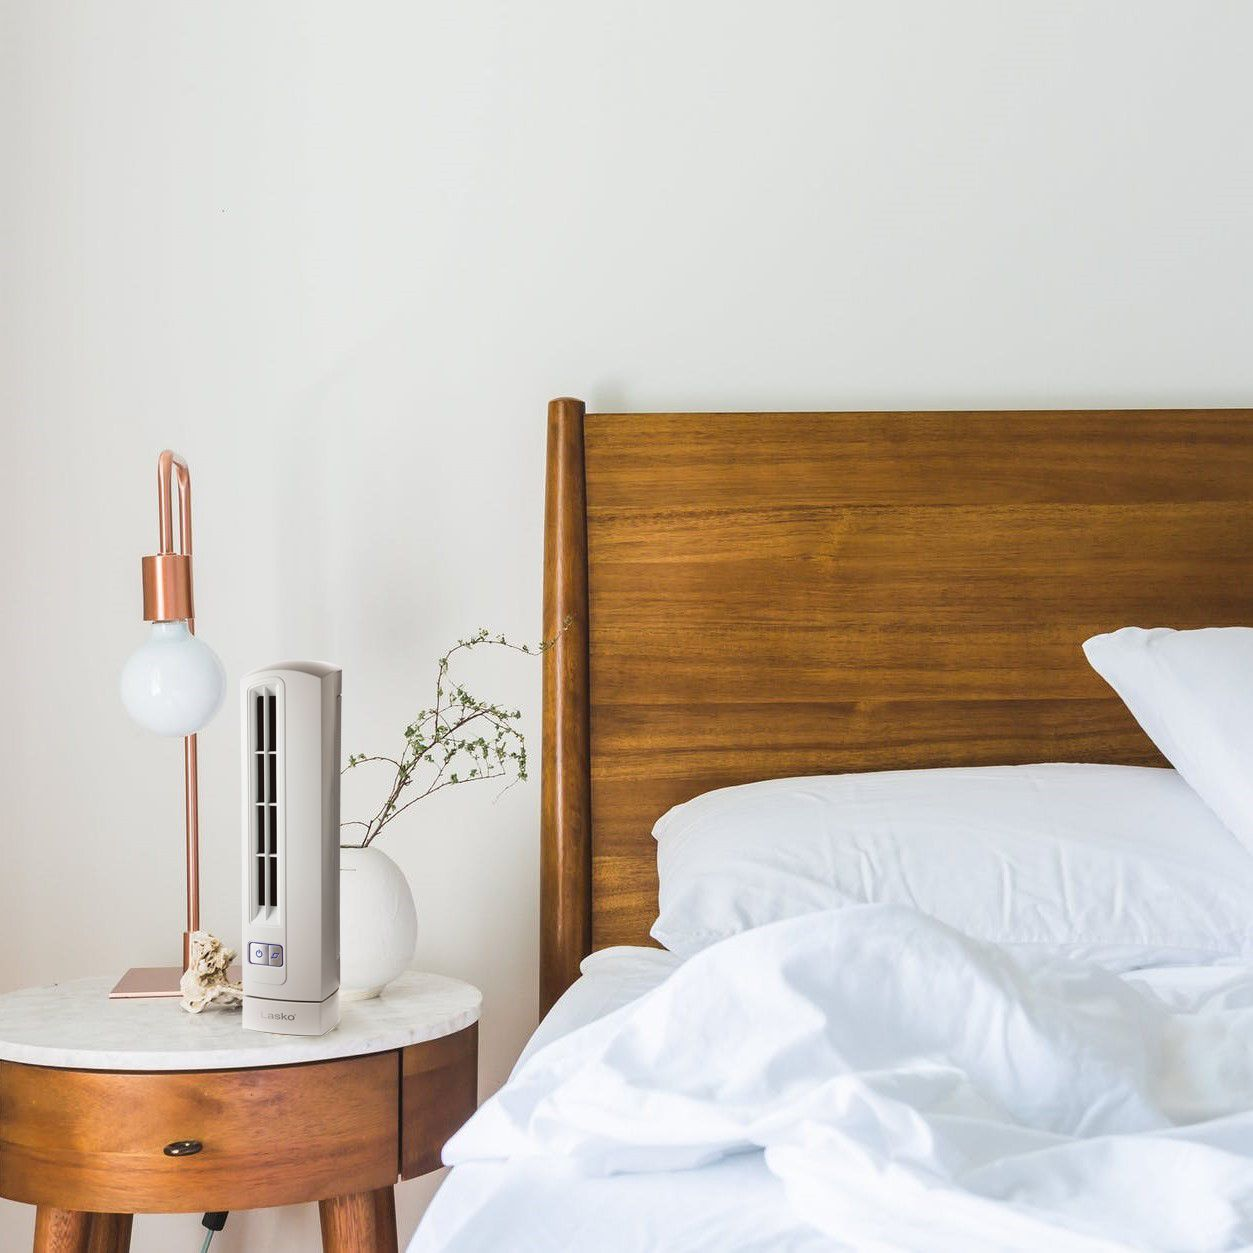 Pin On Cozy Bedroom